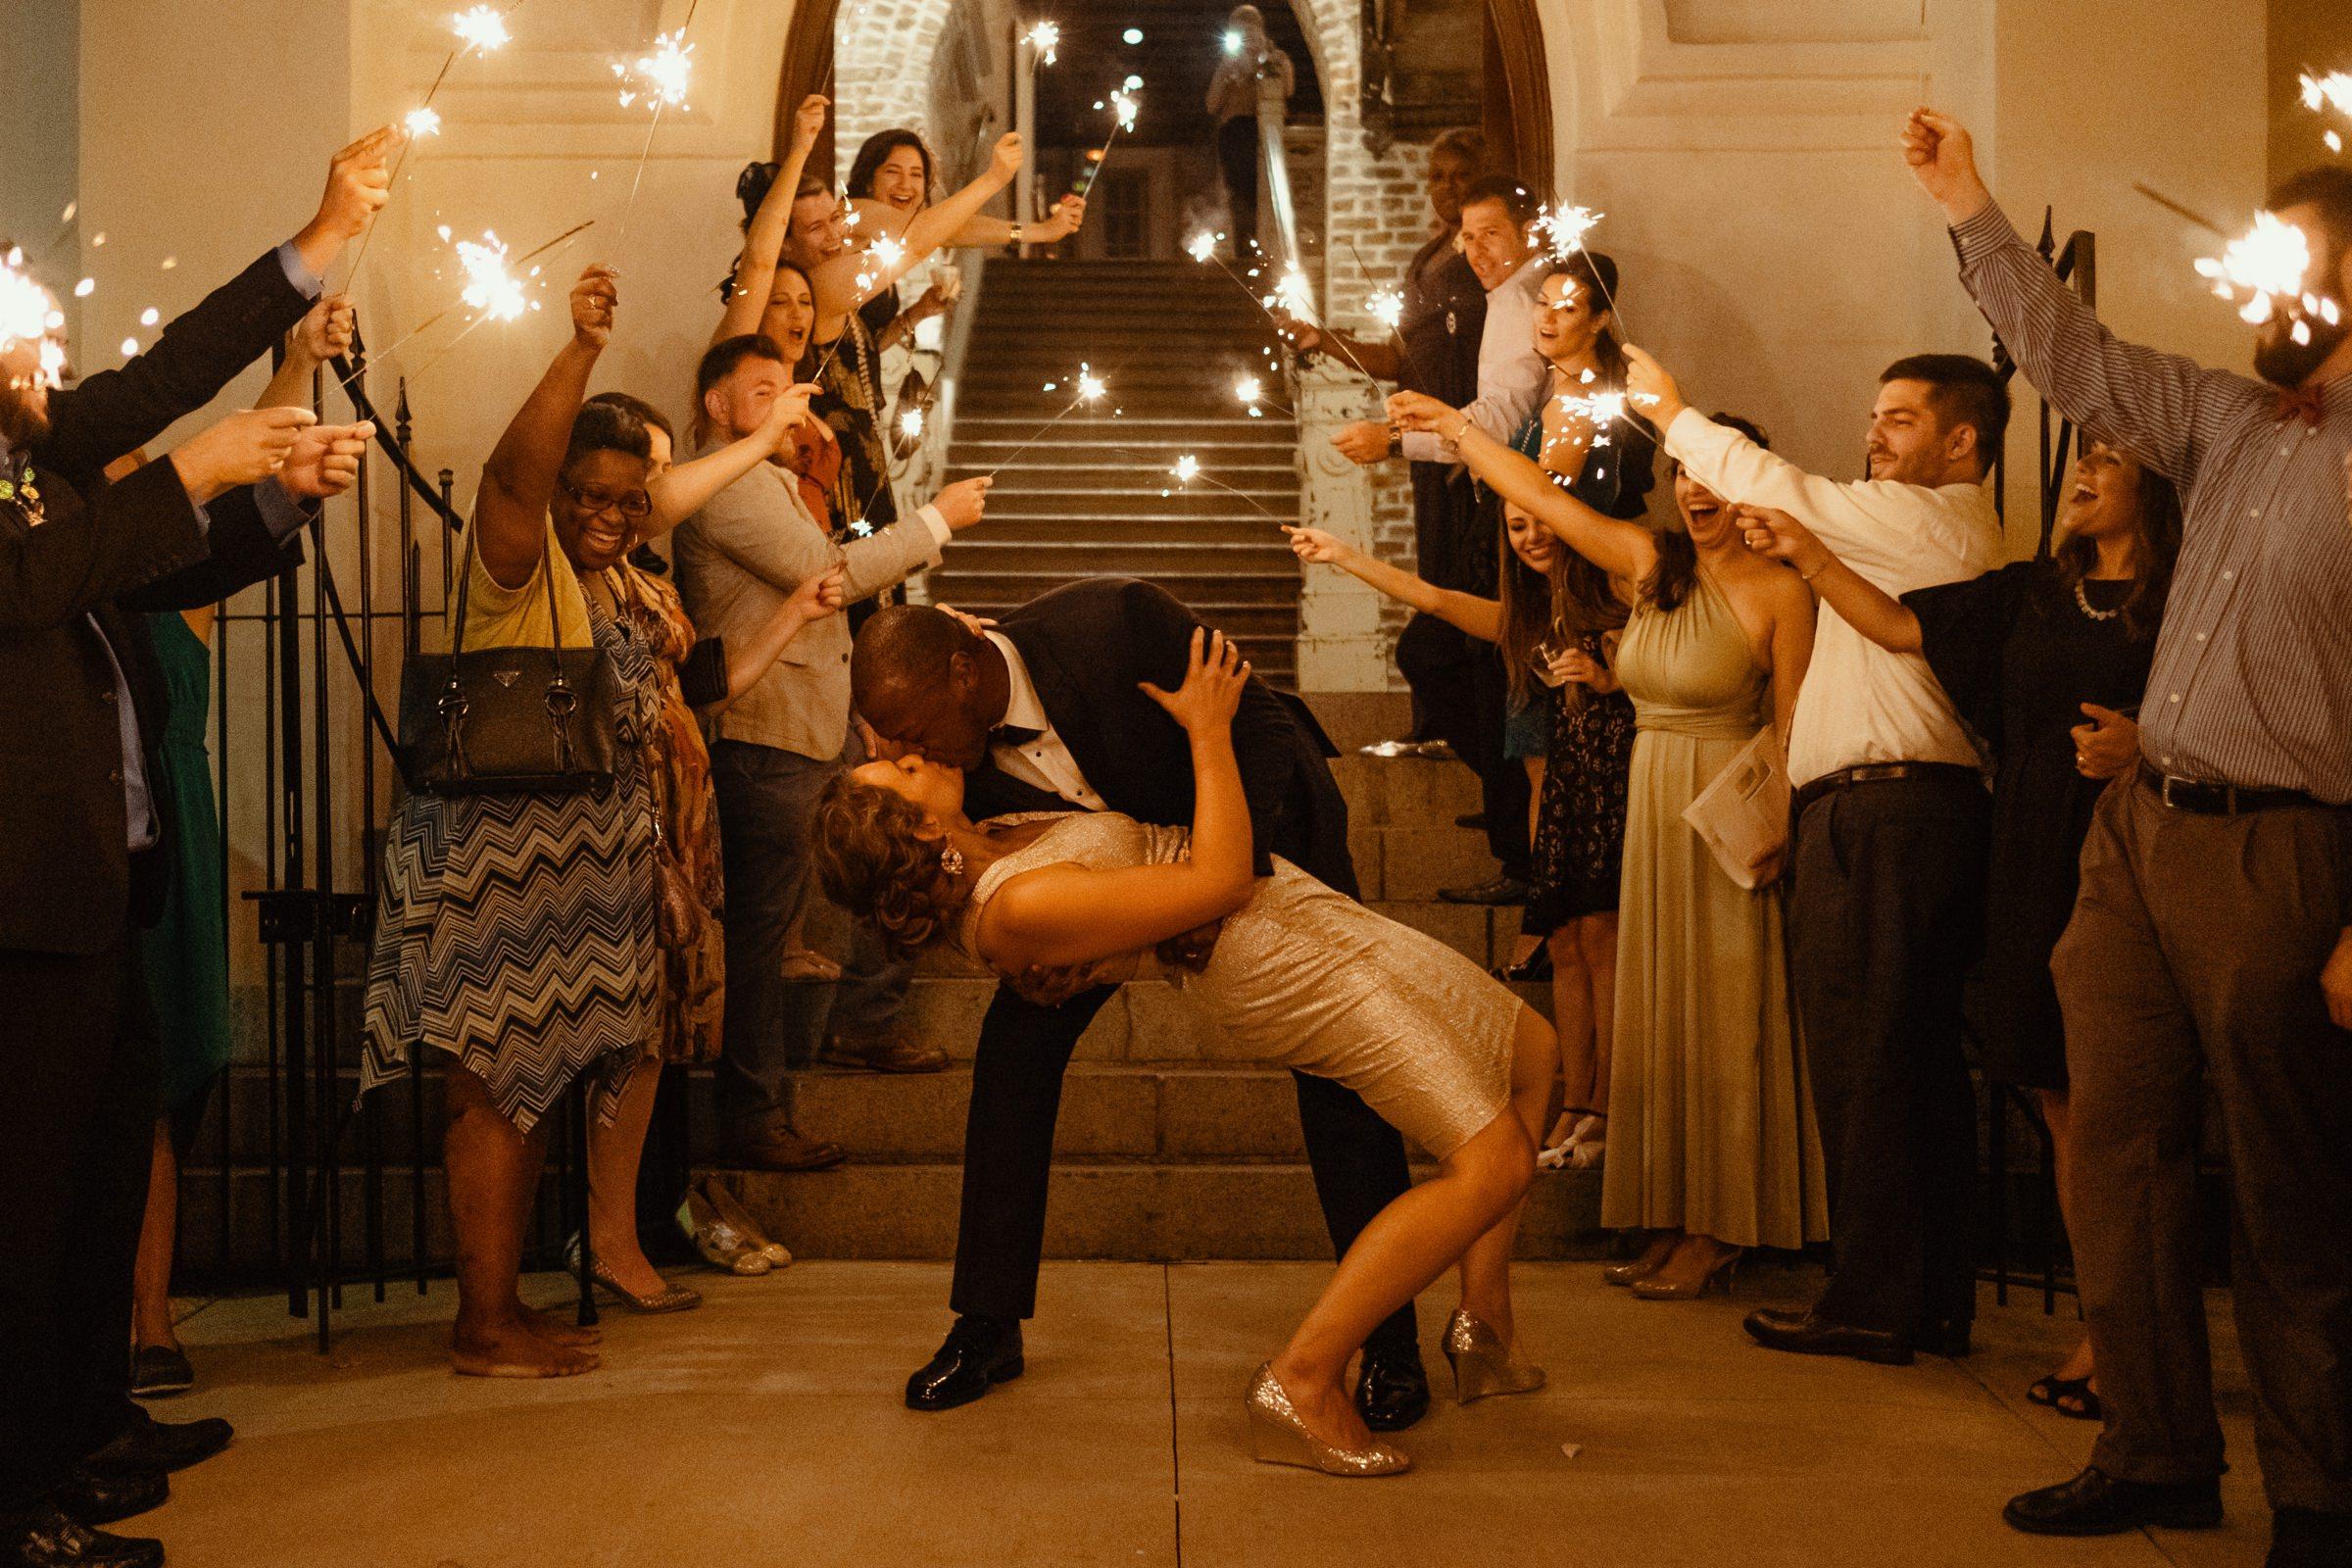 bride-and-groom-exiting-reception-under-sparklers-new-orleans-austin-houston-wedding-photographer-photo-by-dark-roux (2).jpg